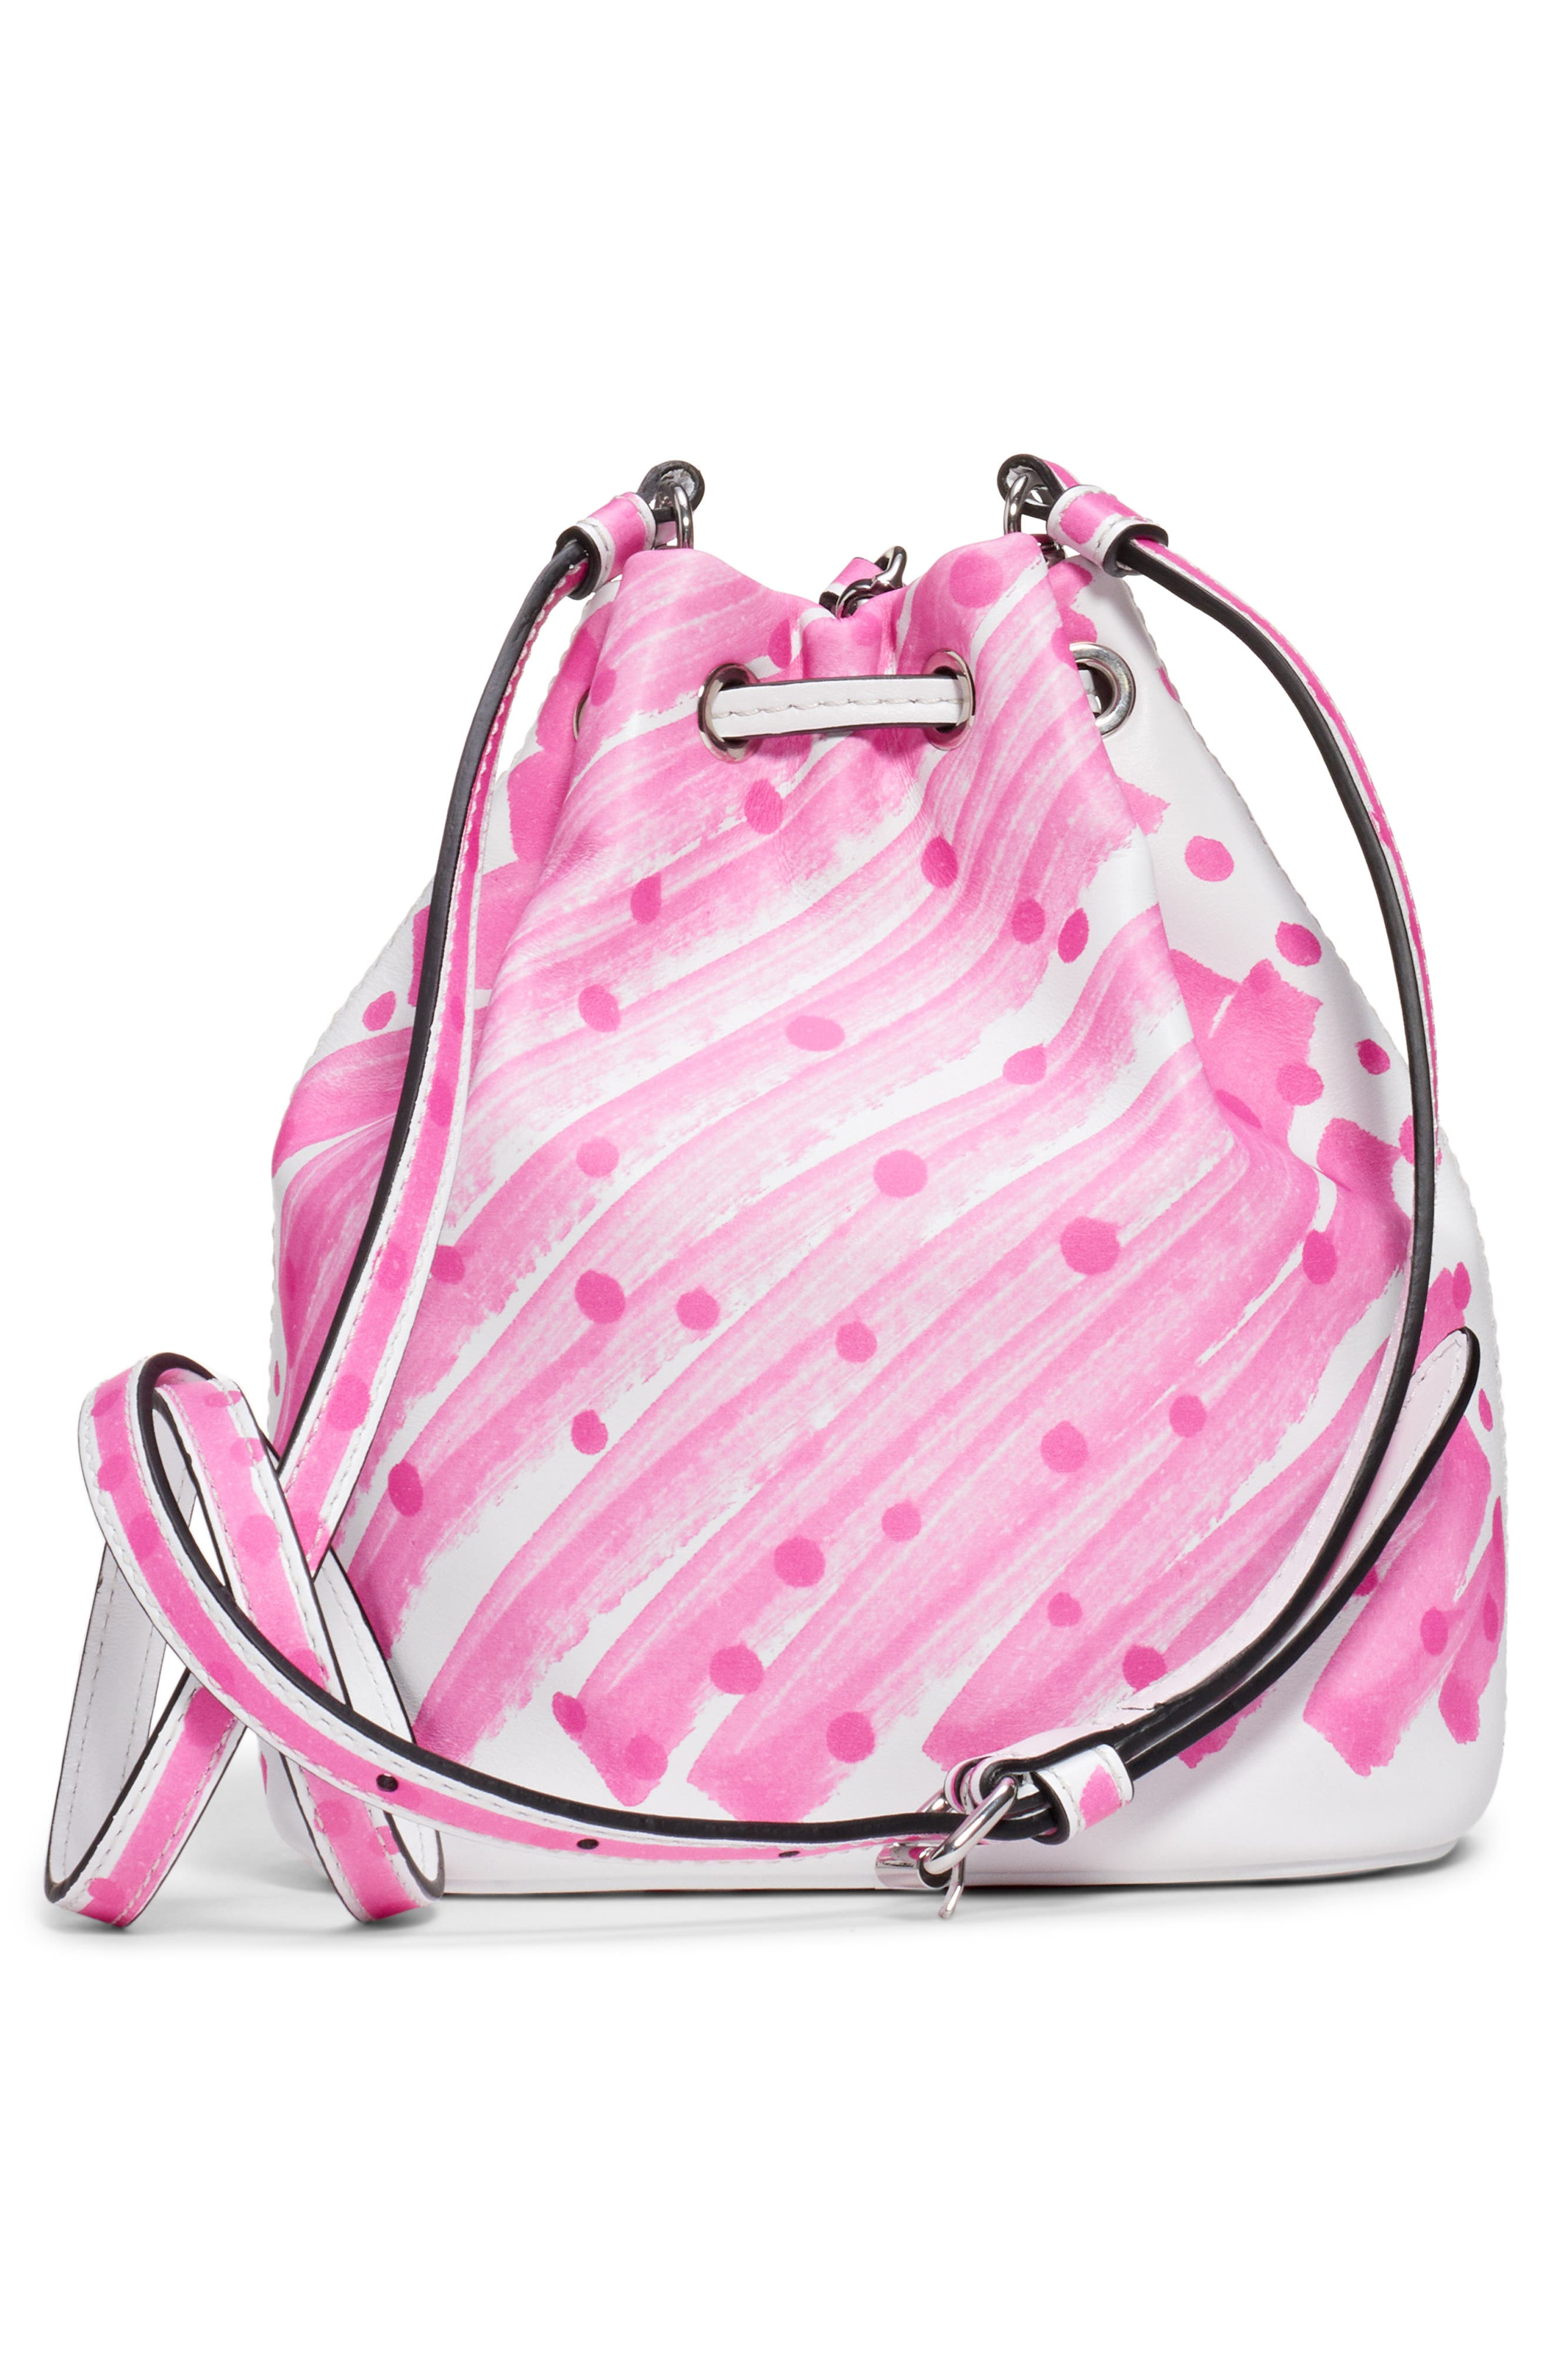 MOSCHINO, Scribble Dot Bucket Bag, Alternate thumbnail 3, color, FANTASY PRINT FUSCHIA